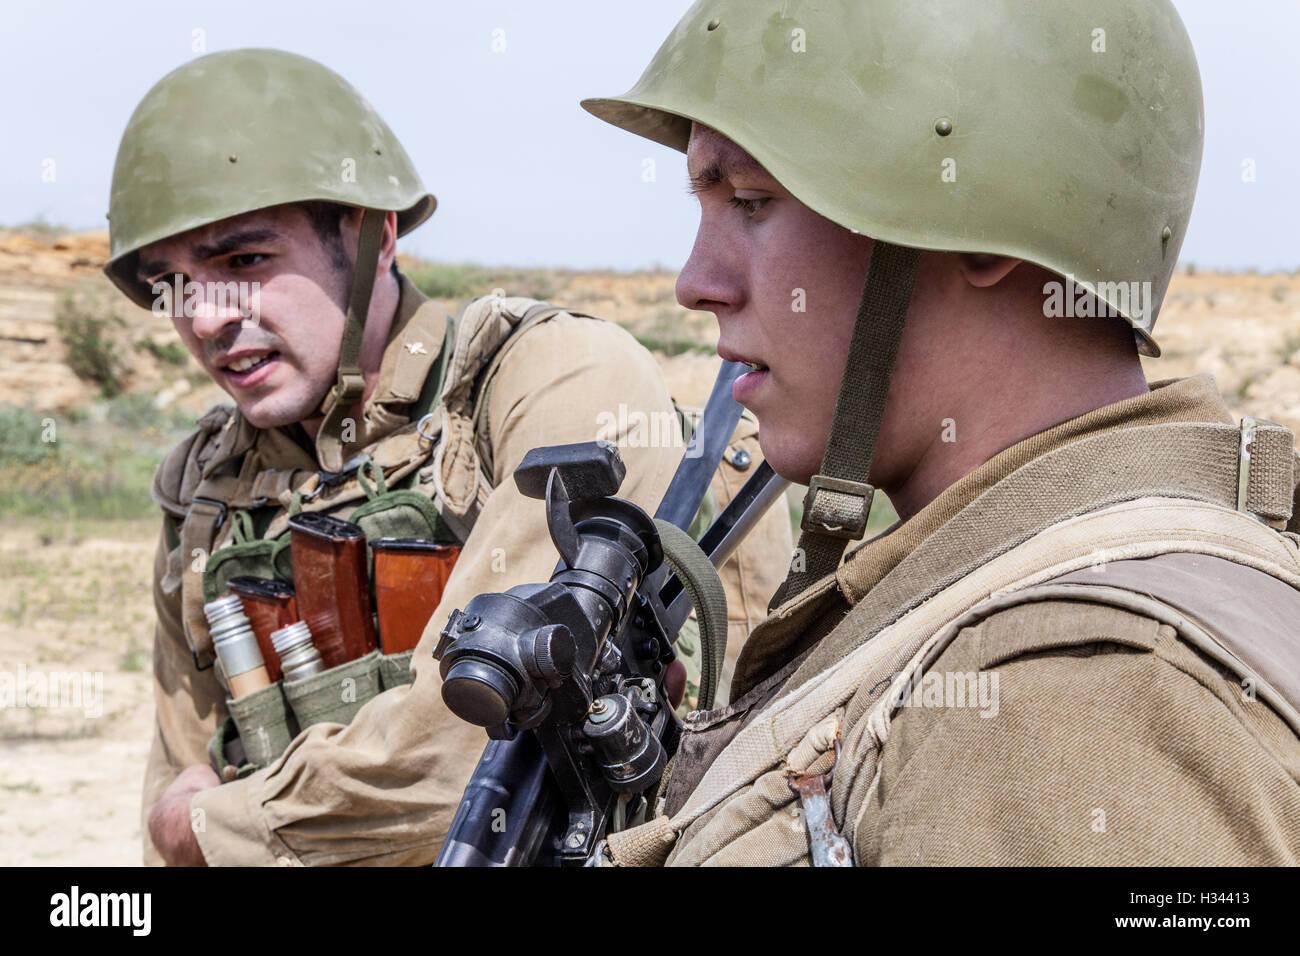 Soviet Afghanistan war - Page 6 Soviet-spetsnaz-in-afghanistan-H34413